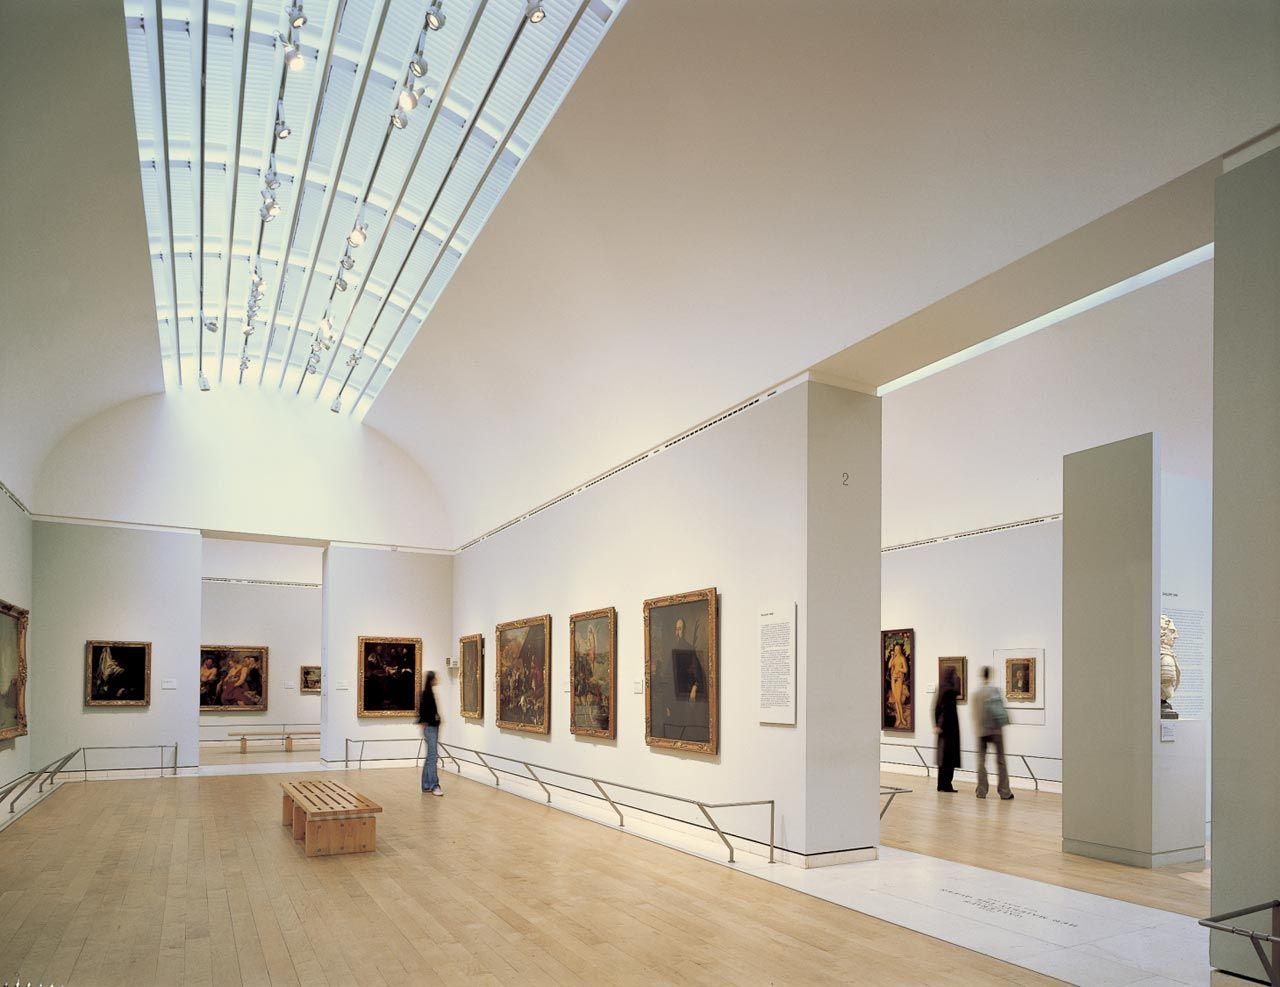 Sackler Galleries, Royal Academy of Arts | Projects | Foster + Partners   Foster PartnersNorman FosterInterior Design ...